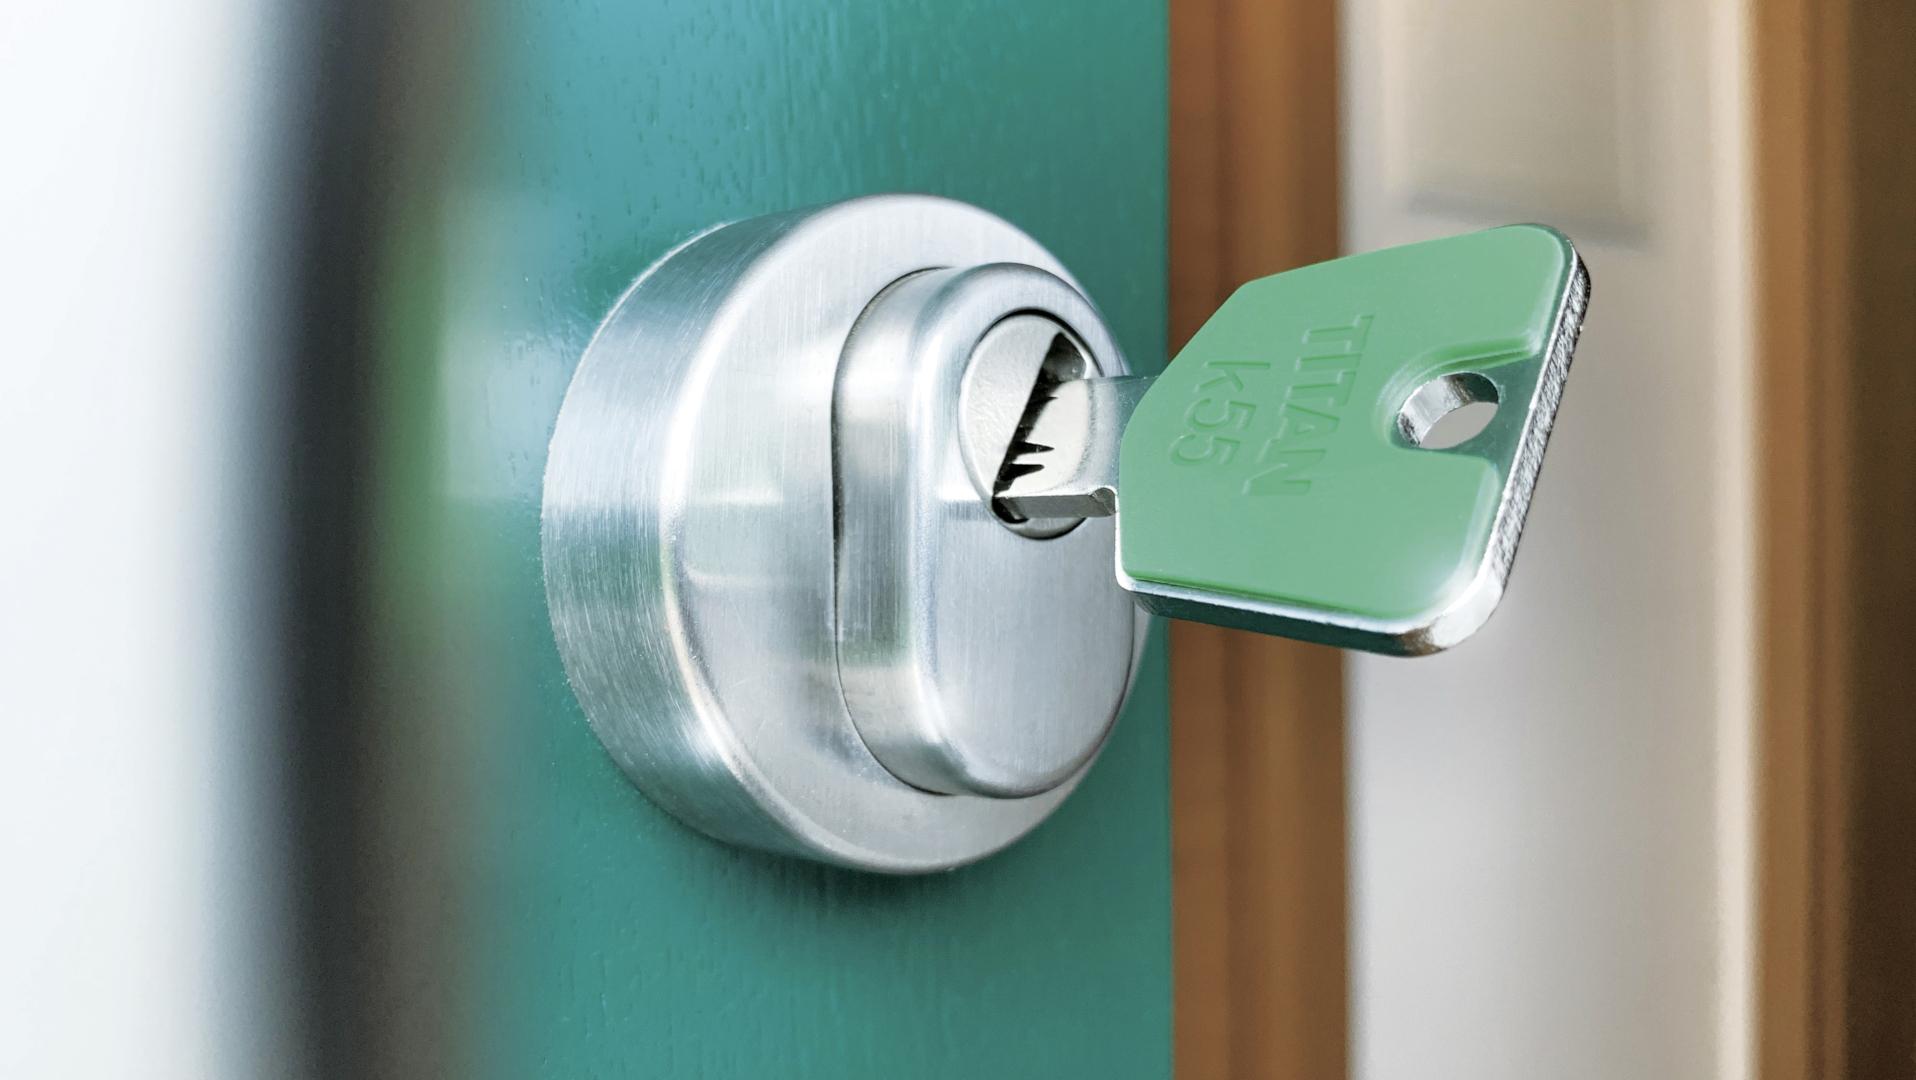 K55 green key